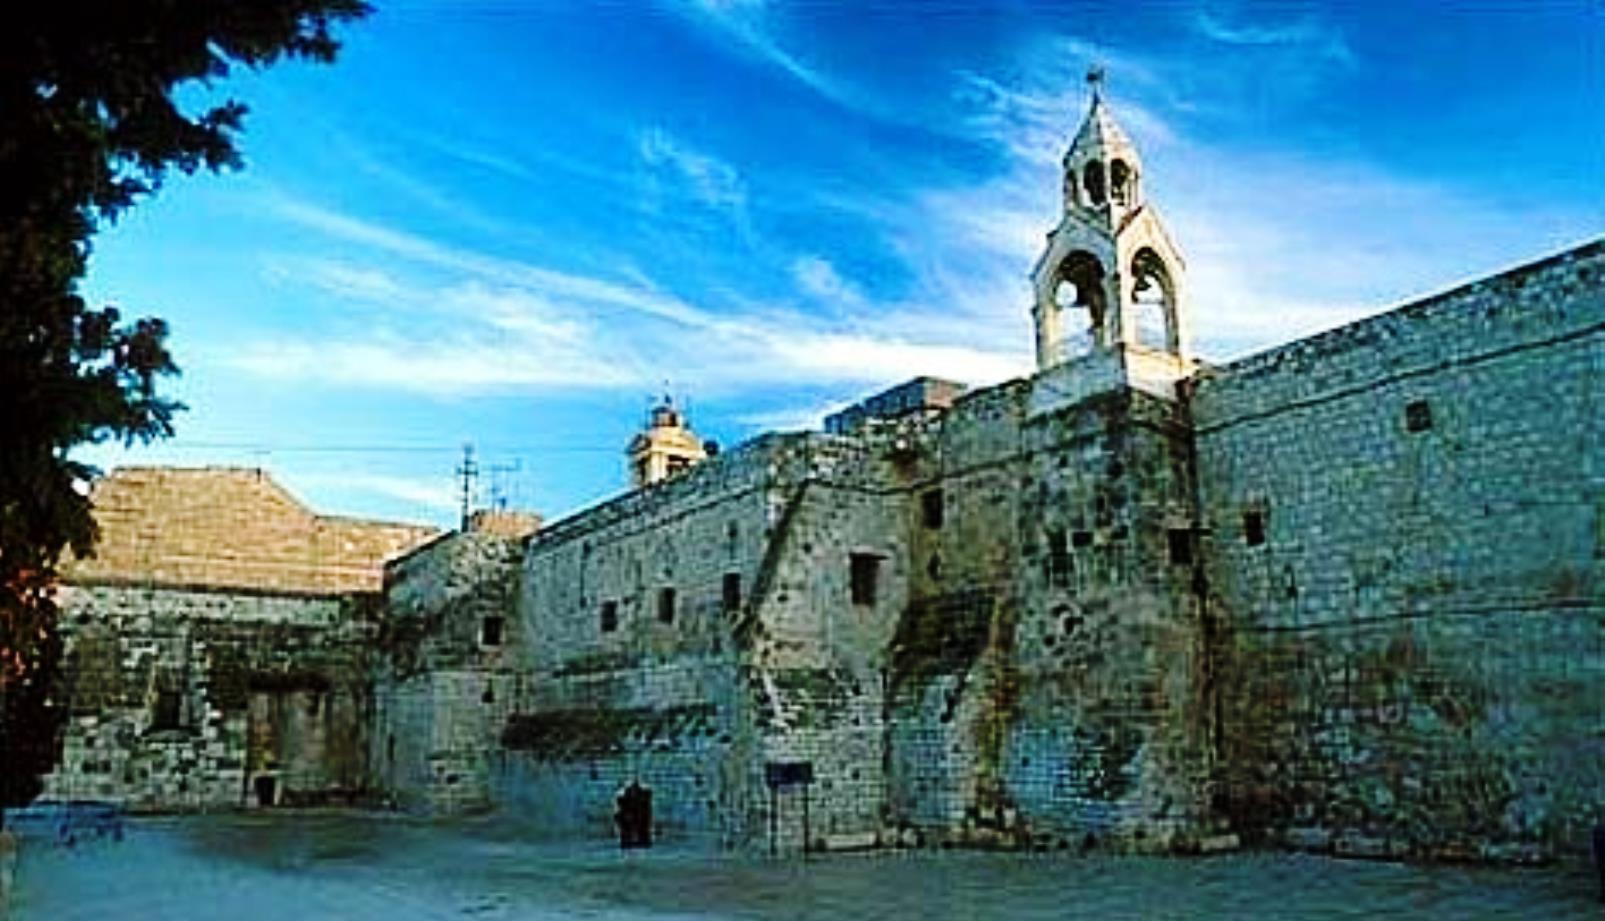 Church of Nativity in Bethlehem.